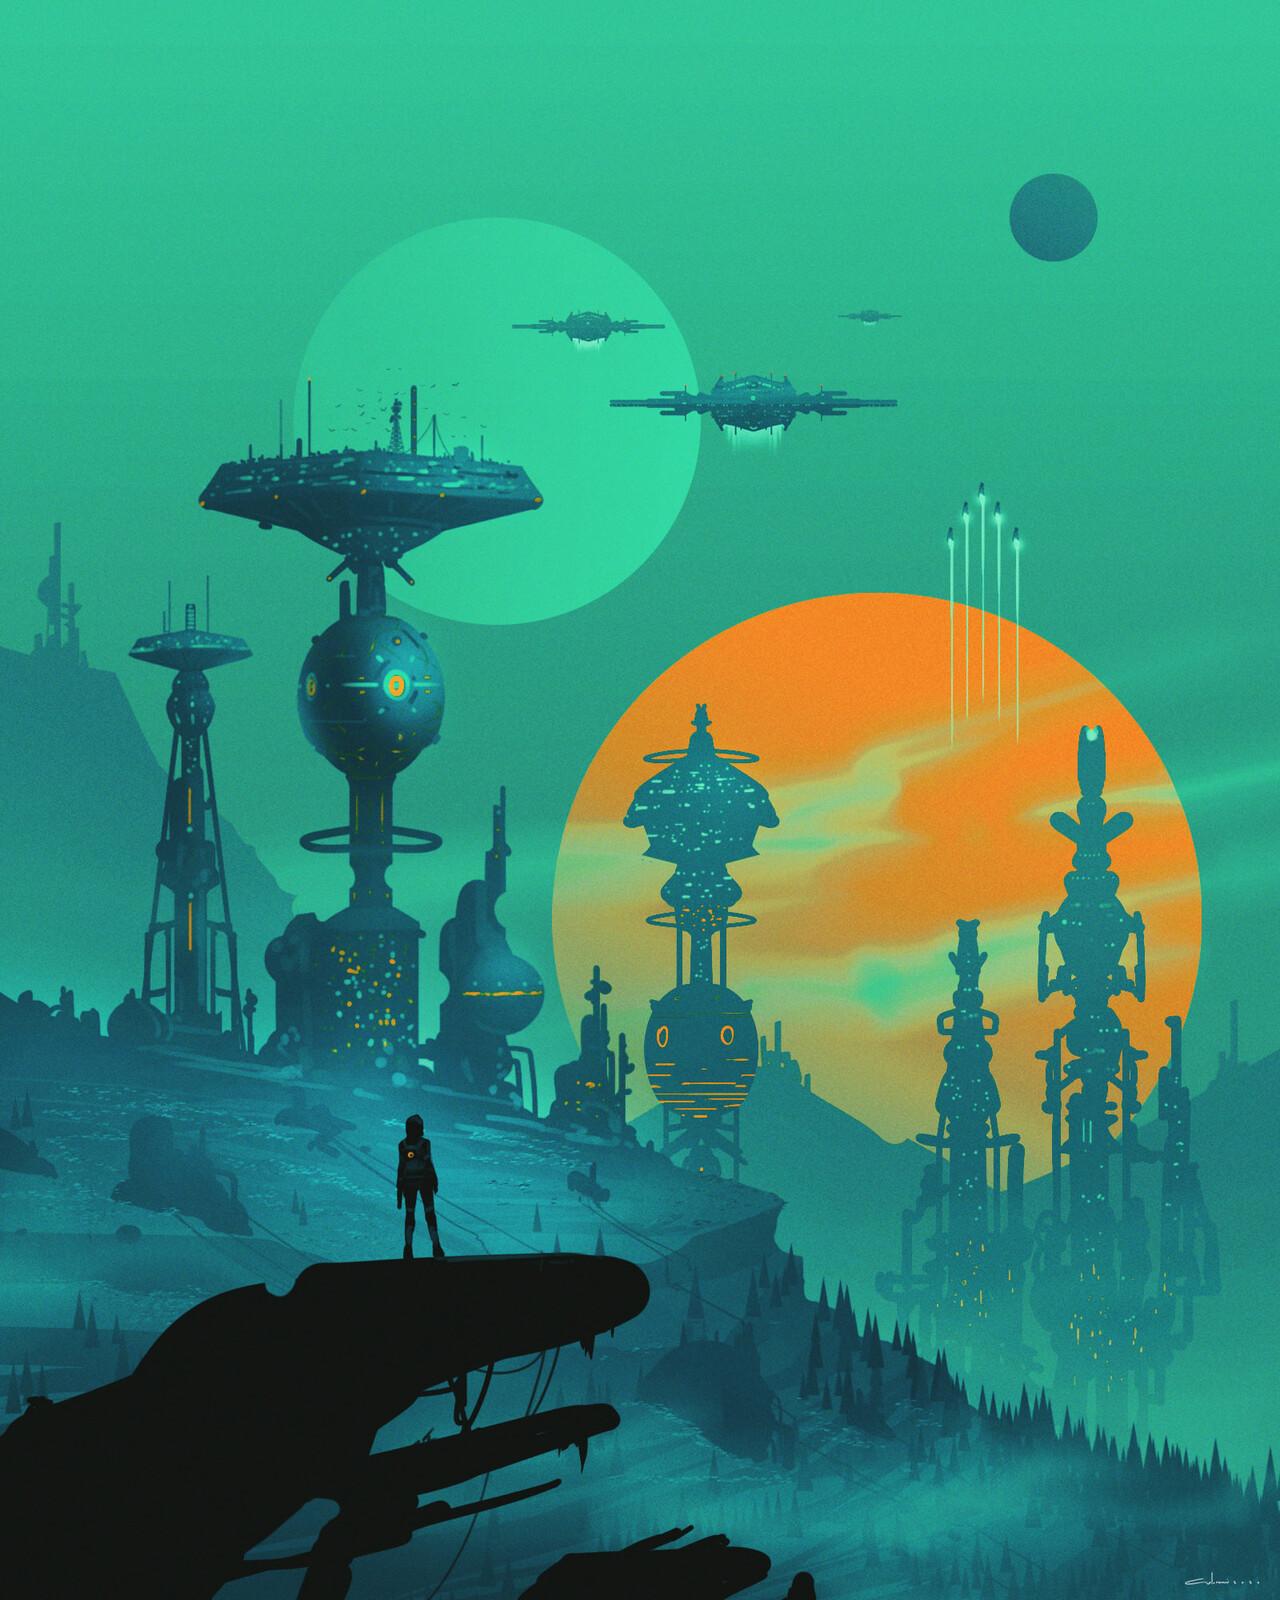 Scifi Environment - Planet X